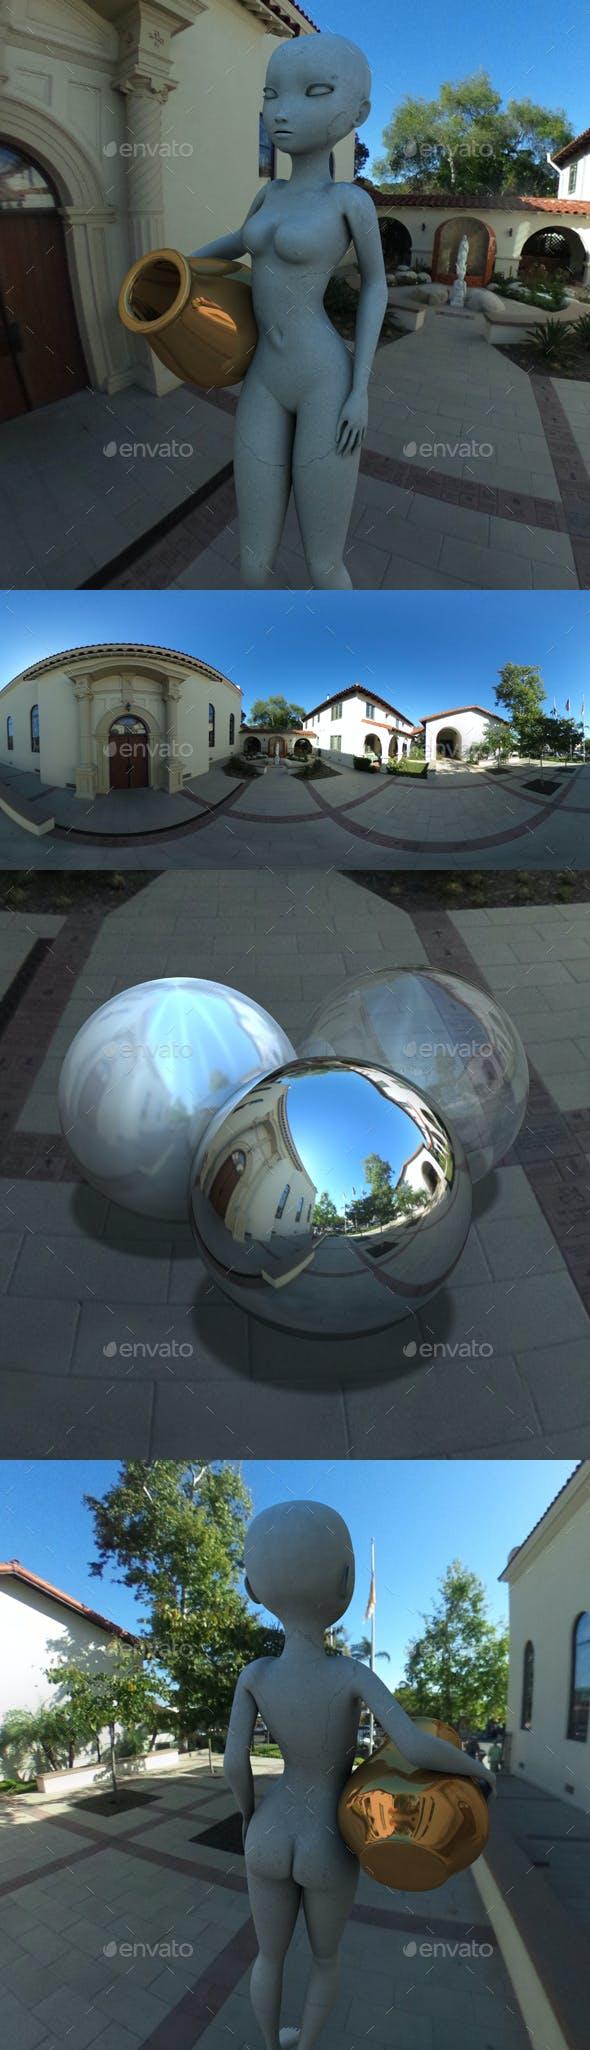 Church Courtyard San Diego HDRI - 3DOcean Item for Sale